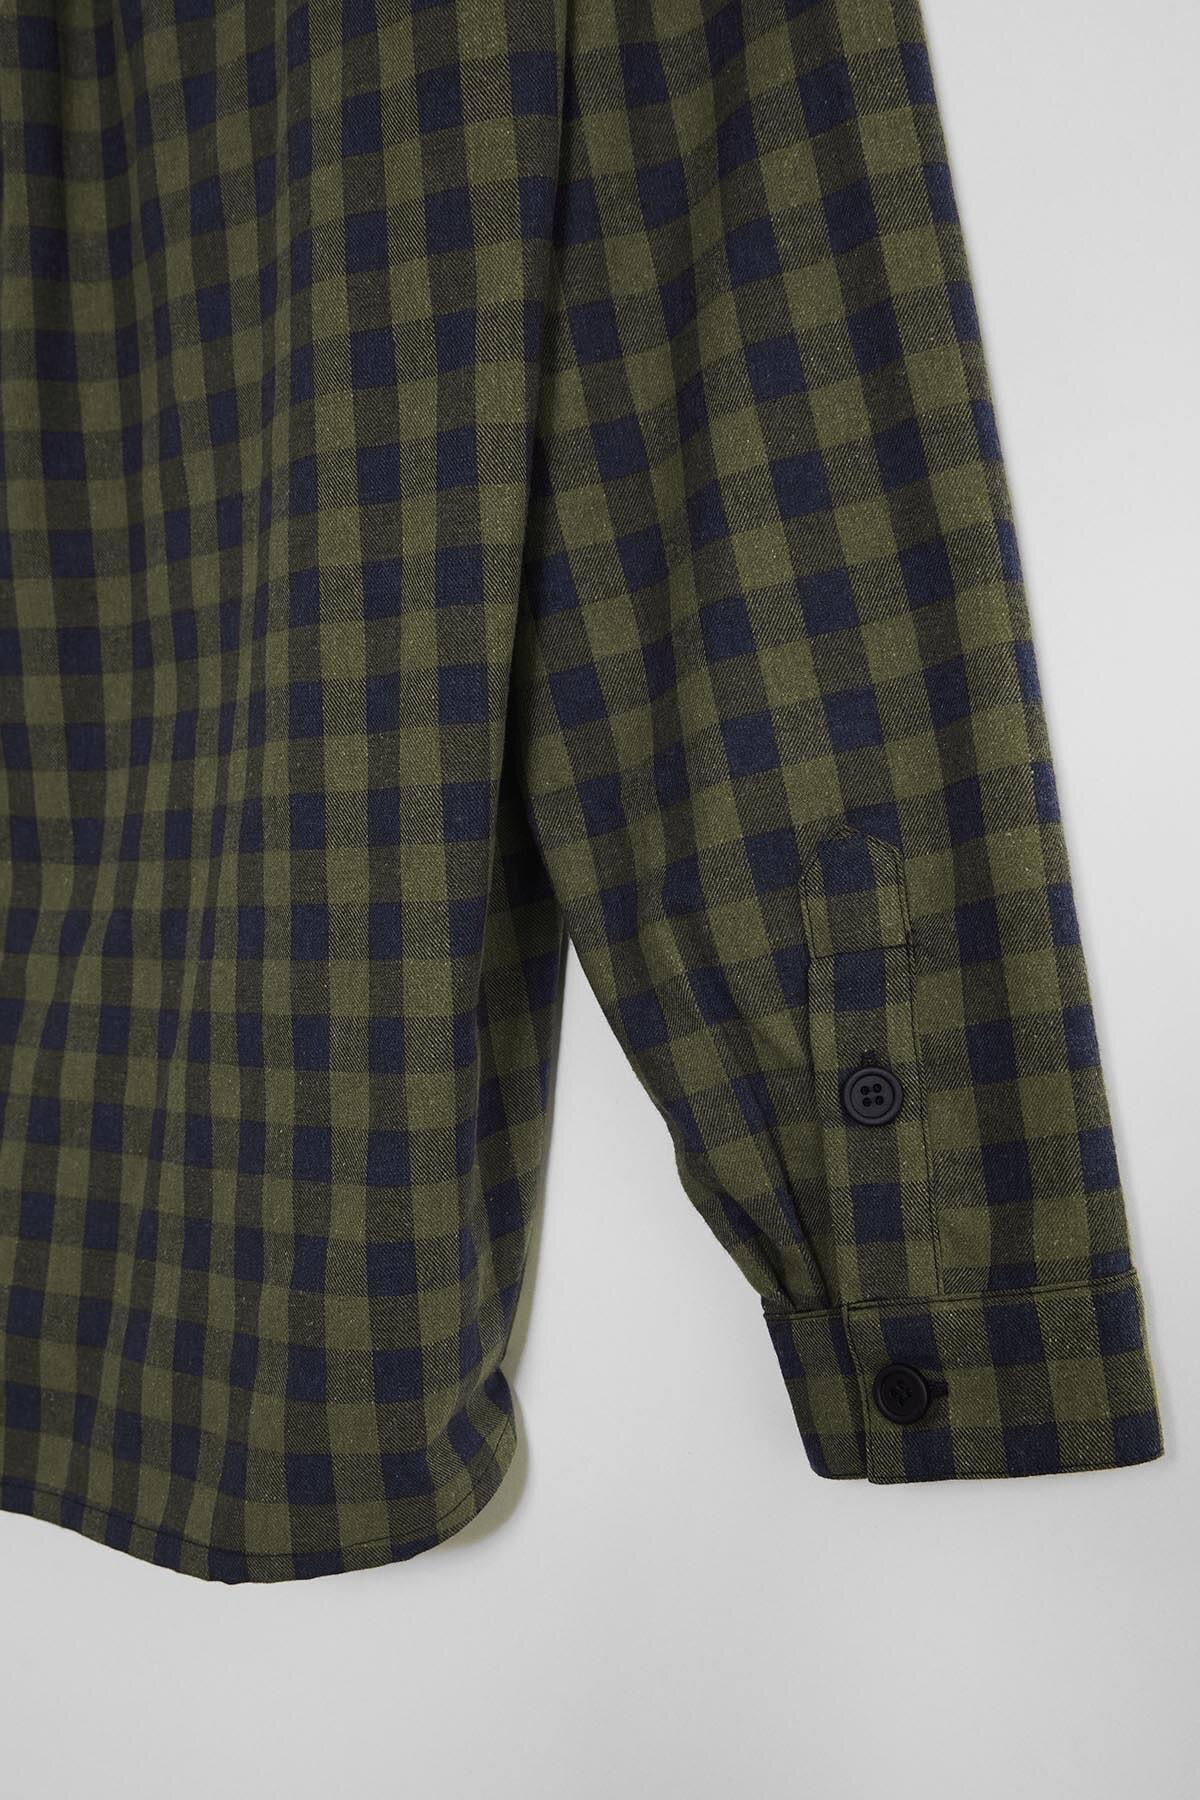 GRIMELANGE BRETT Erkek Yeşil Kareli Regular Gömlek 2